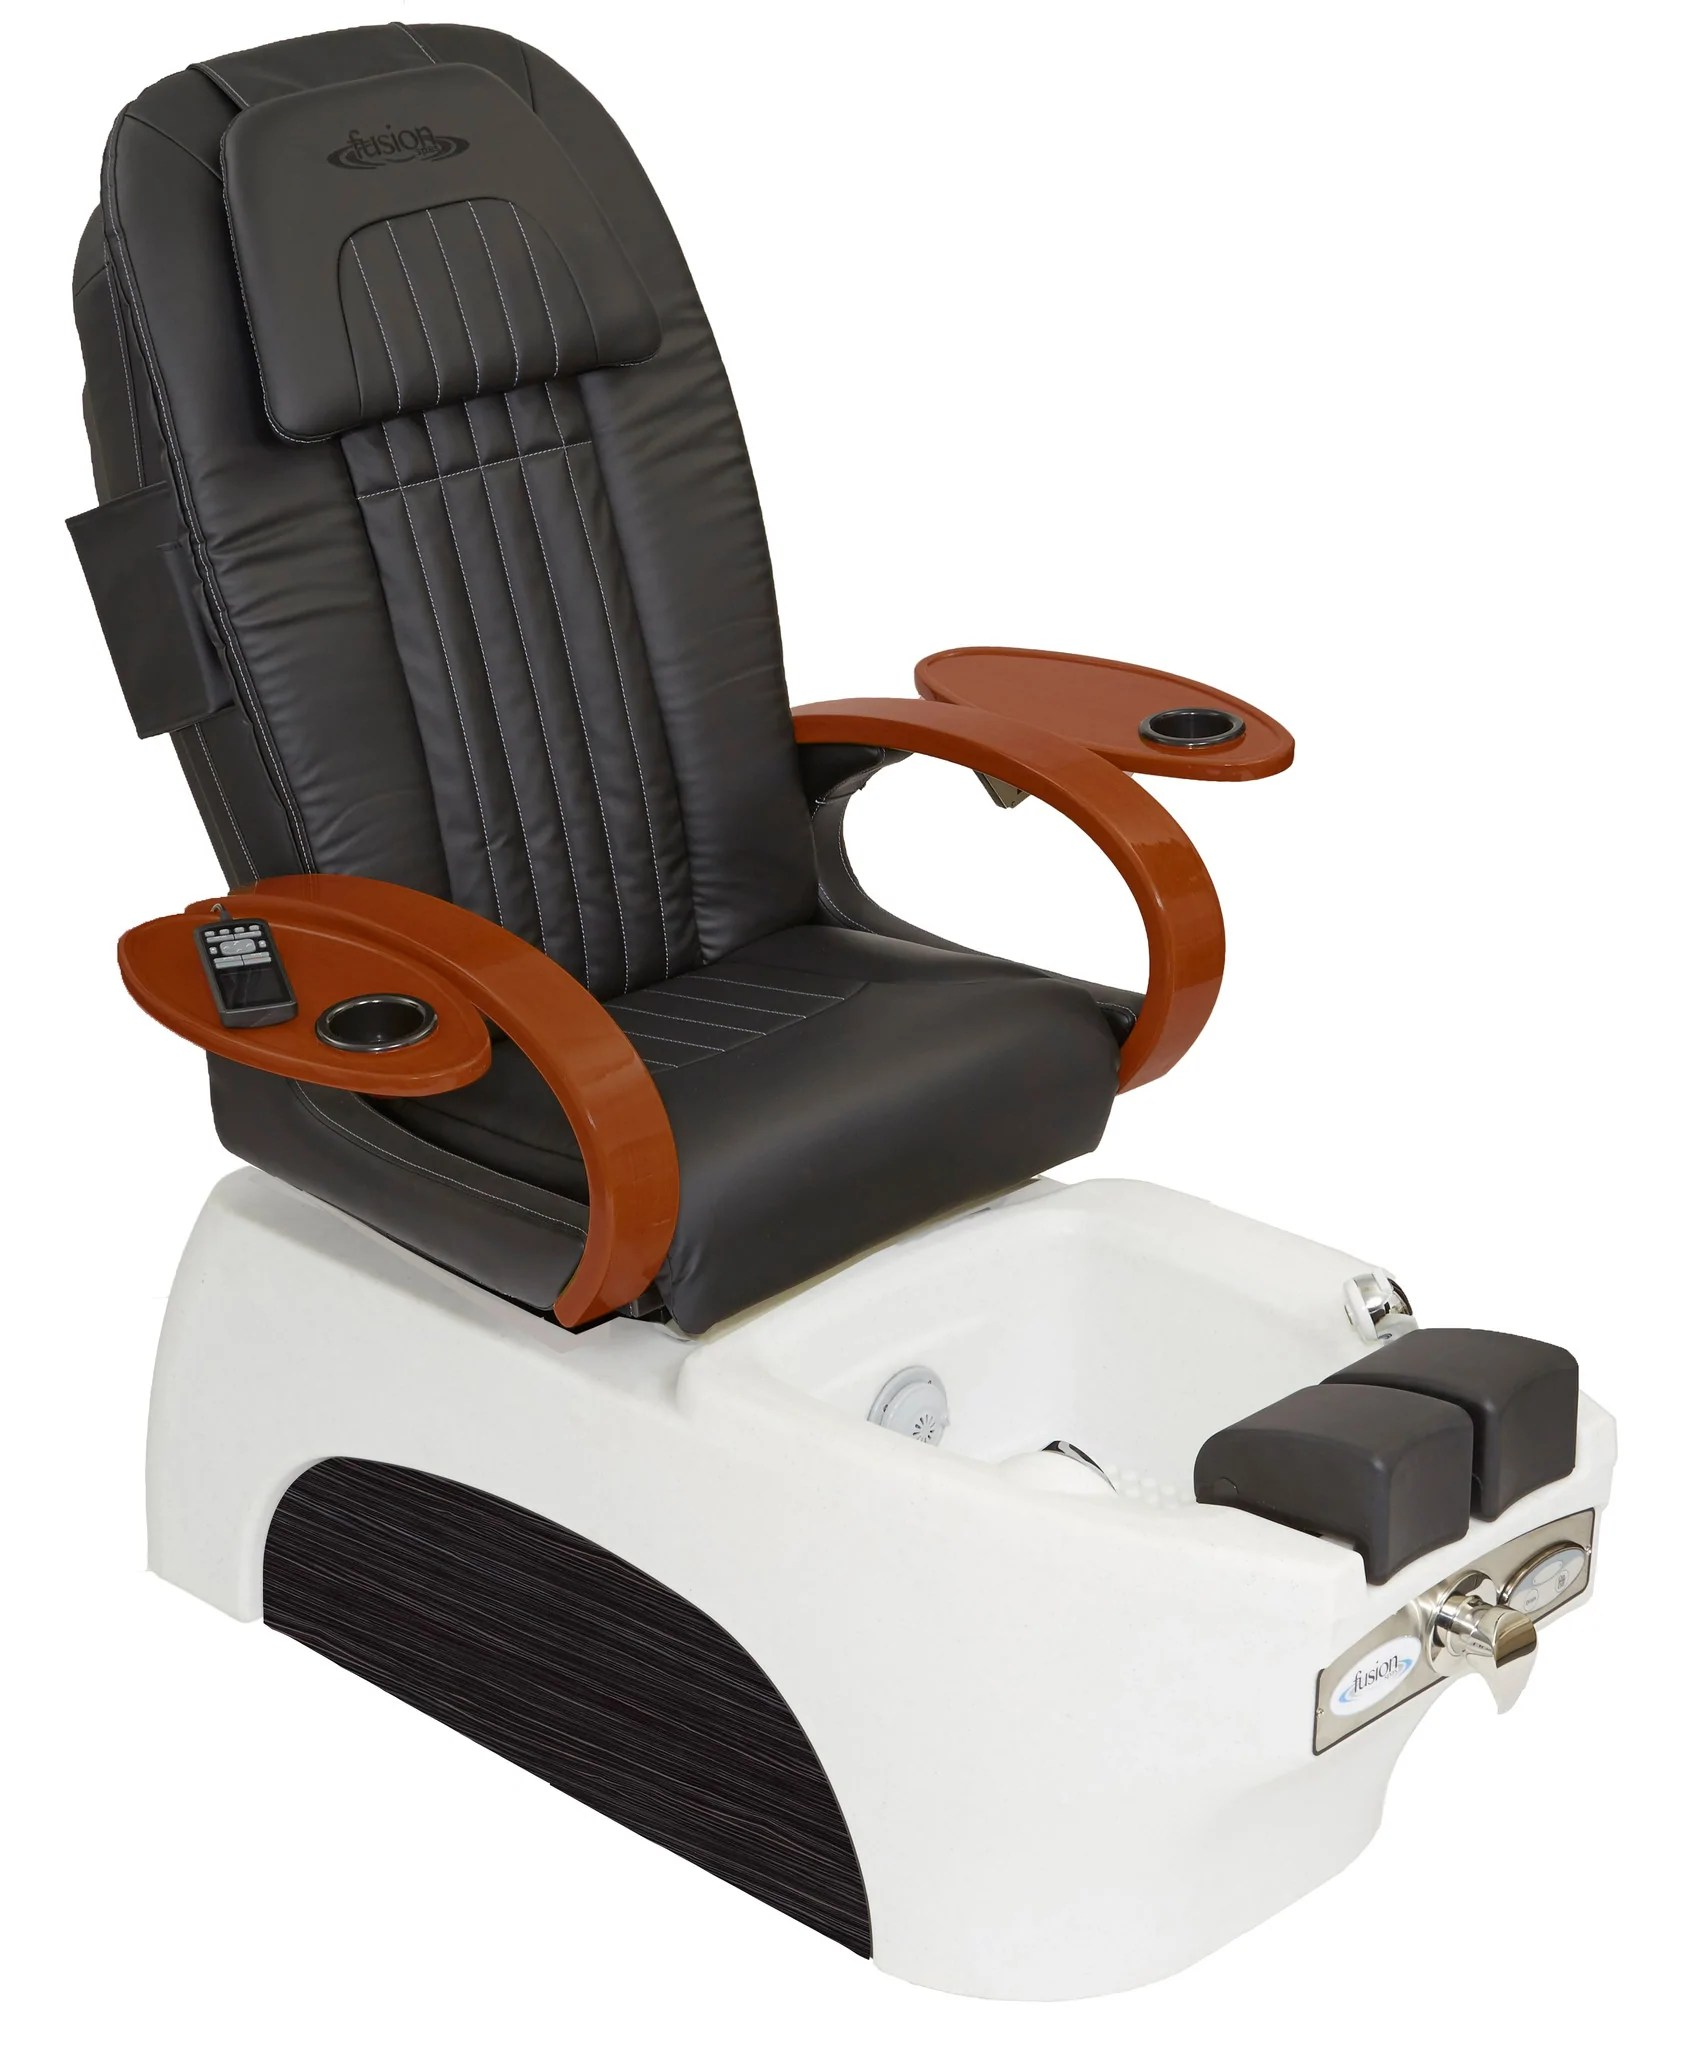 massage pedicure chair office mat walmart fusion spas luna spa w shiatsu manicure tray aria chairs